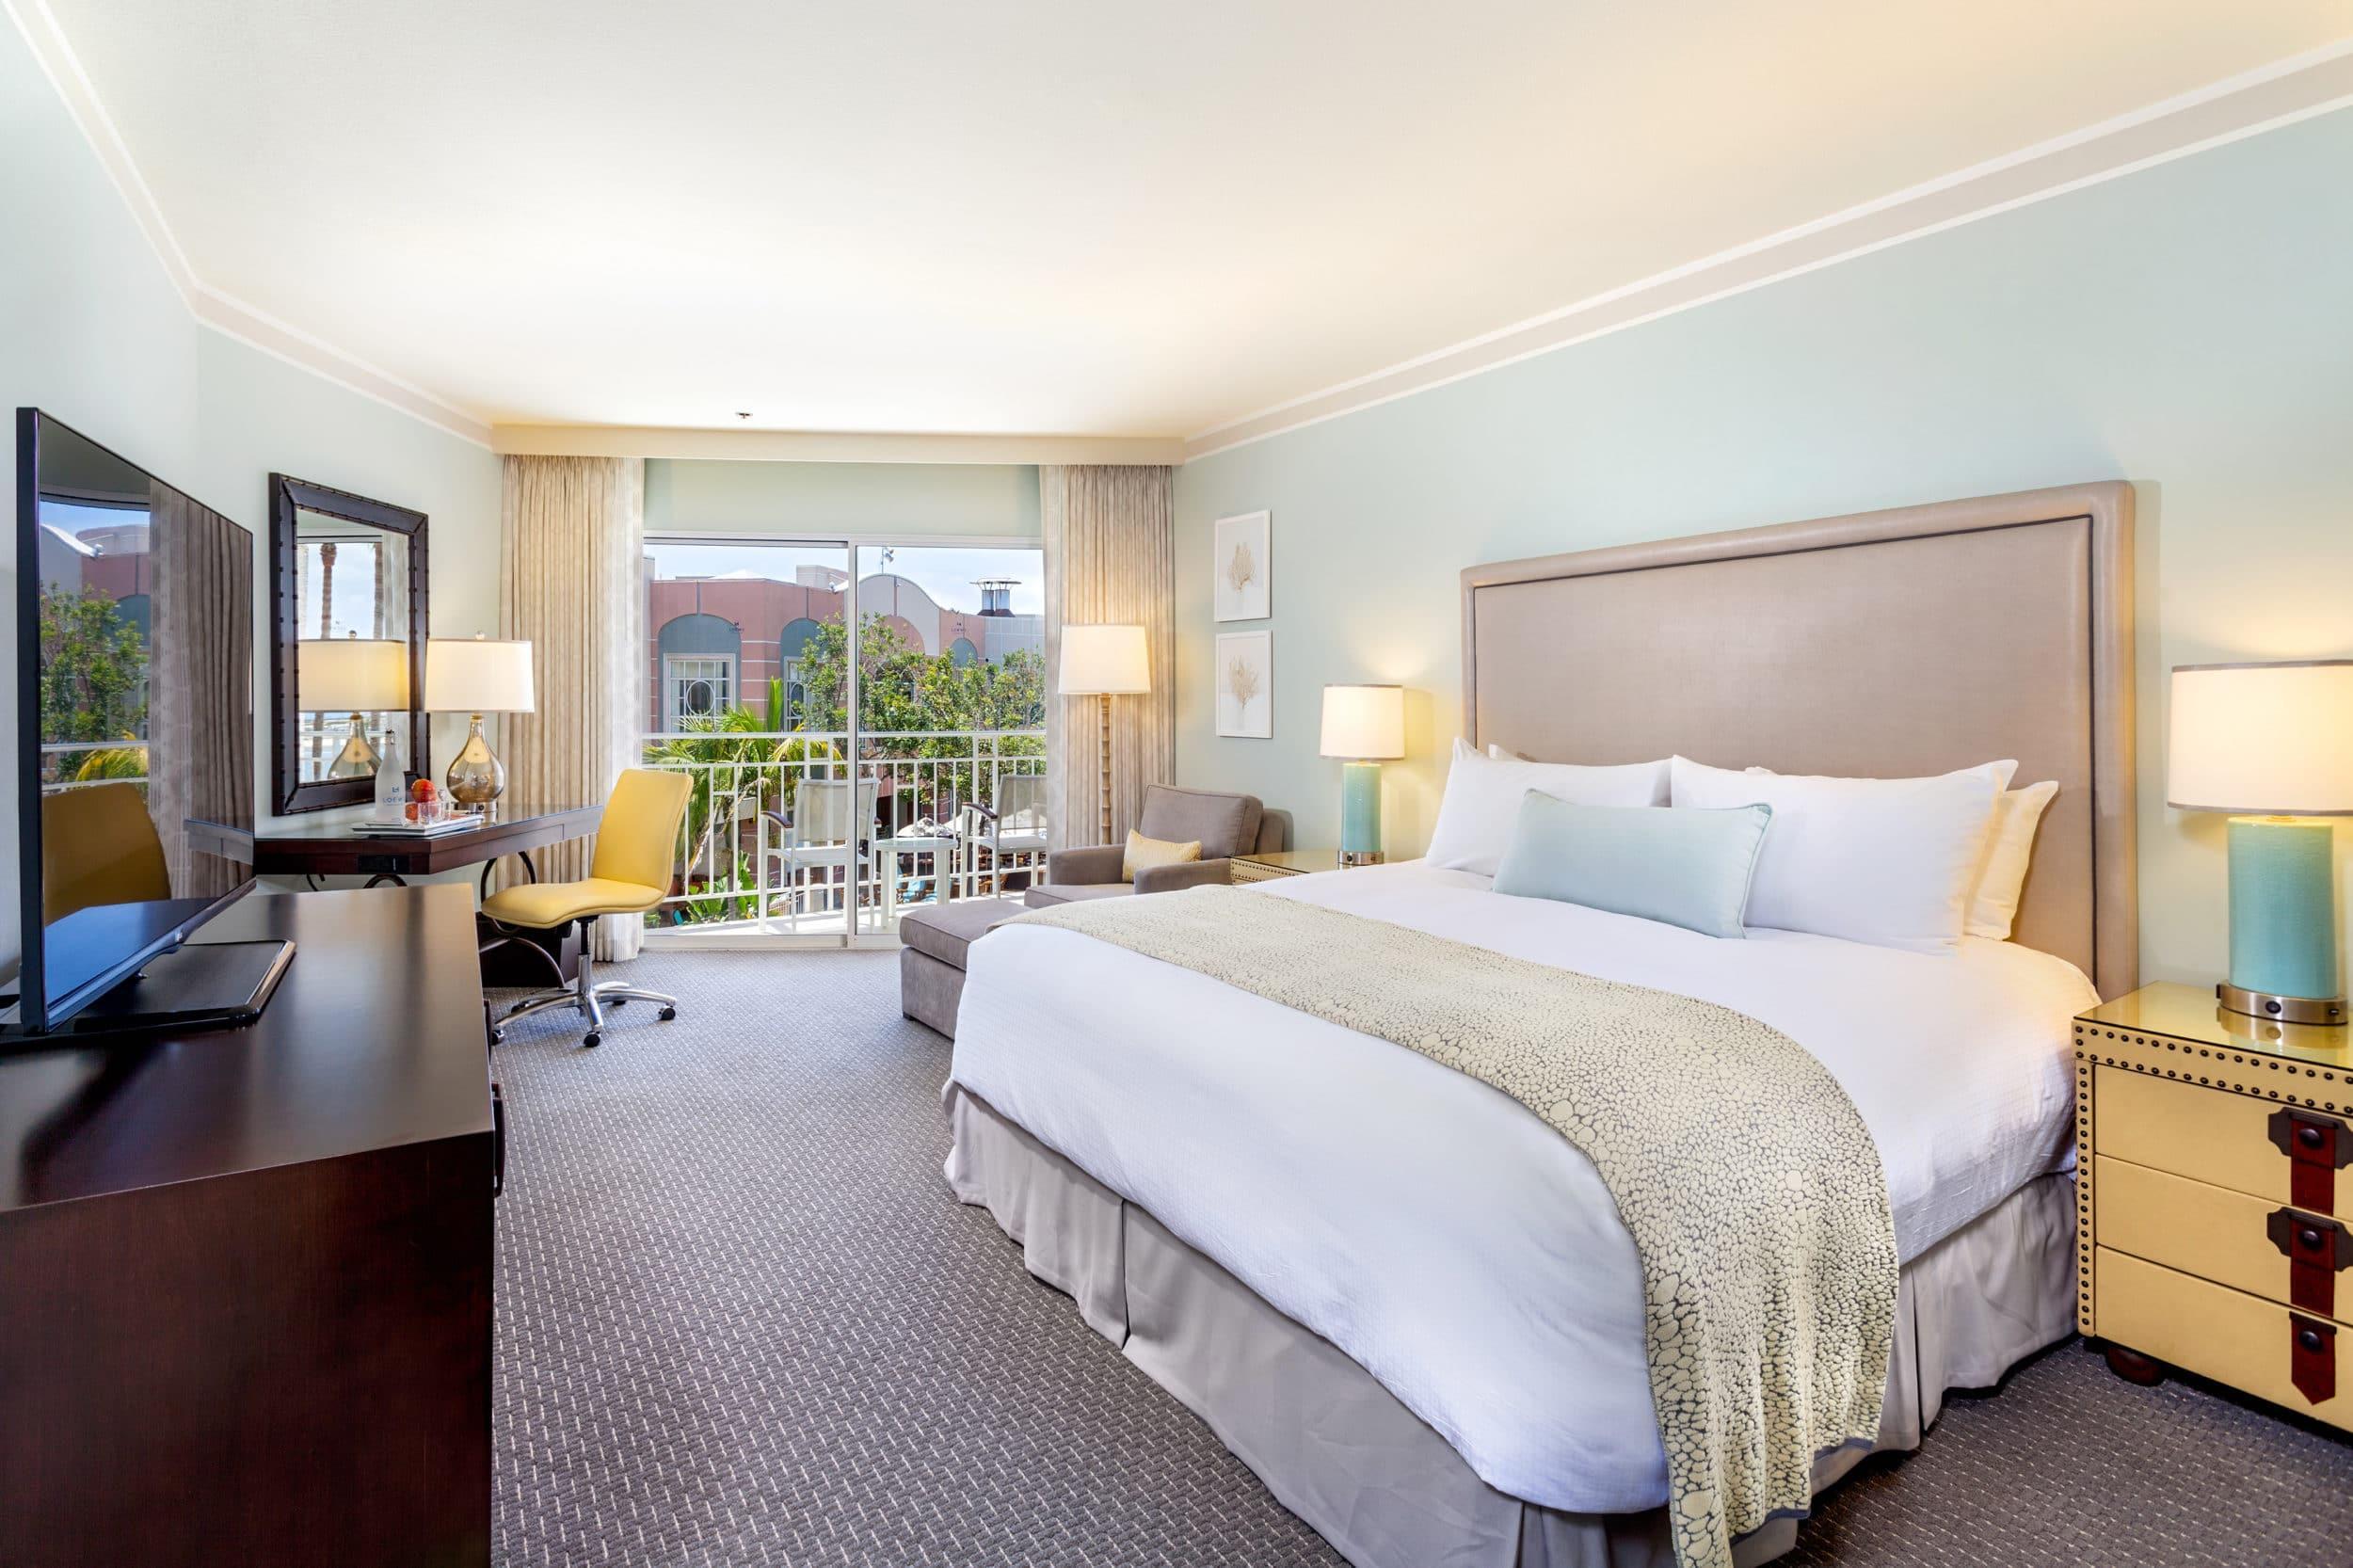 YSK Furniture wholesale hotel room furnishings project-1